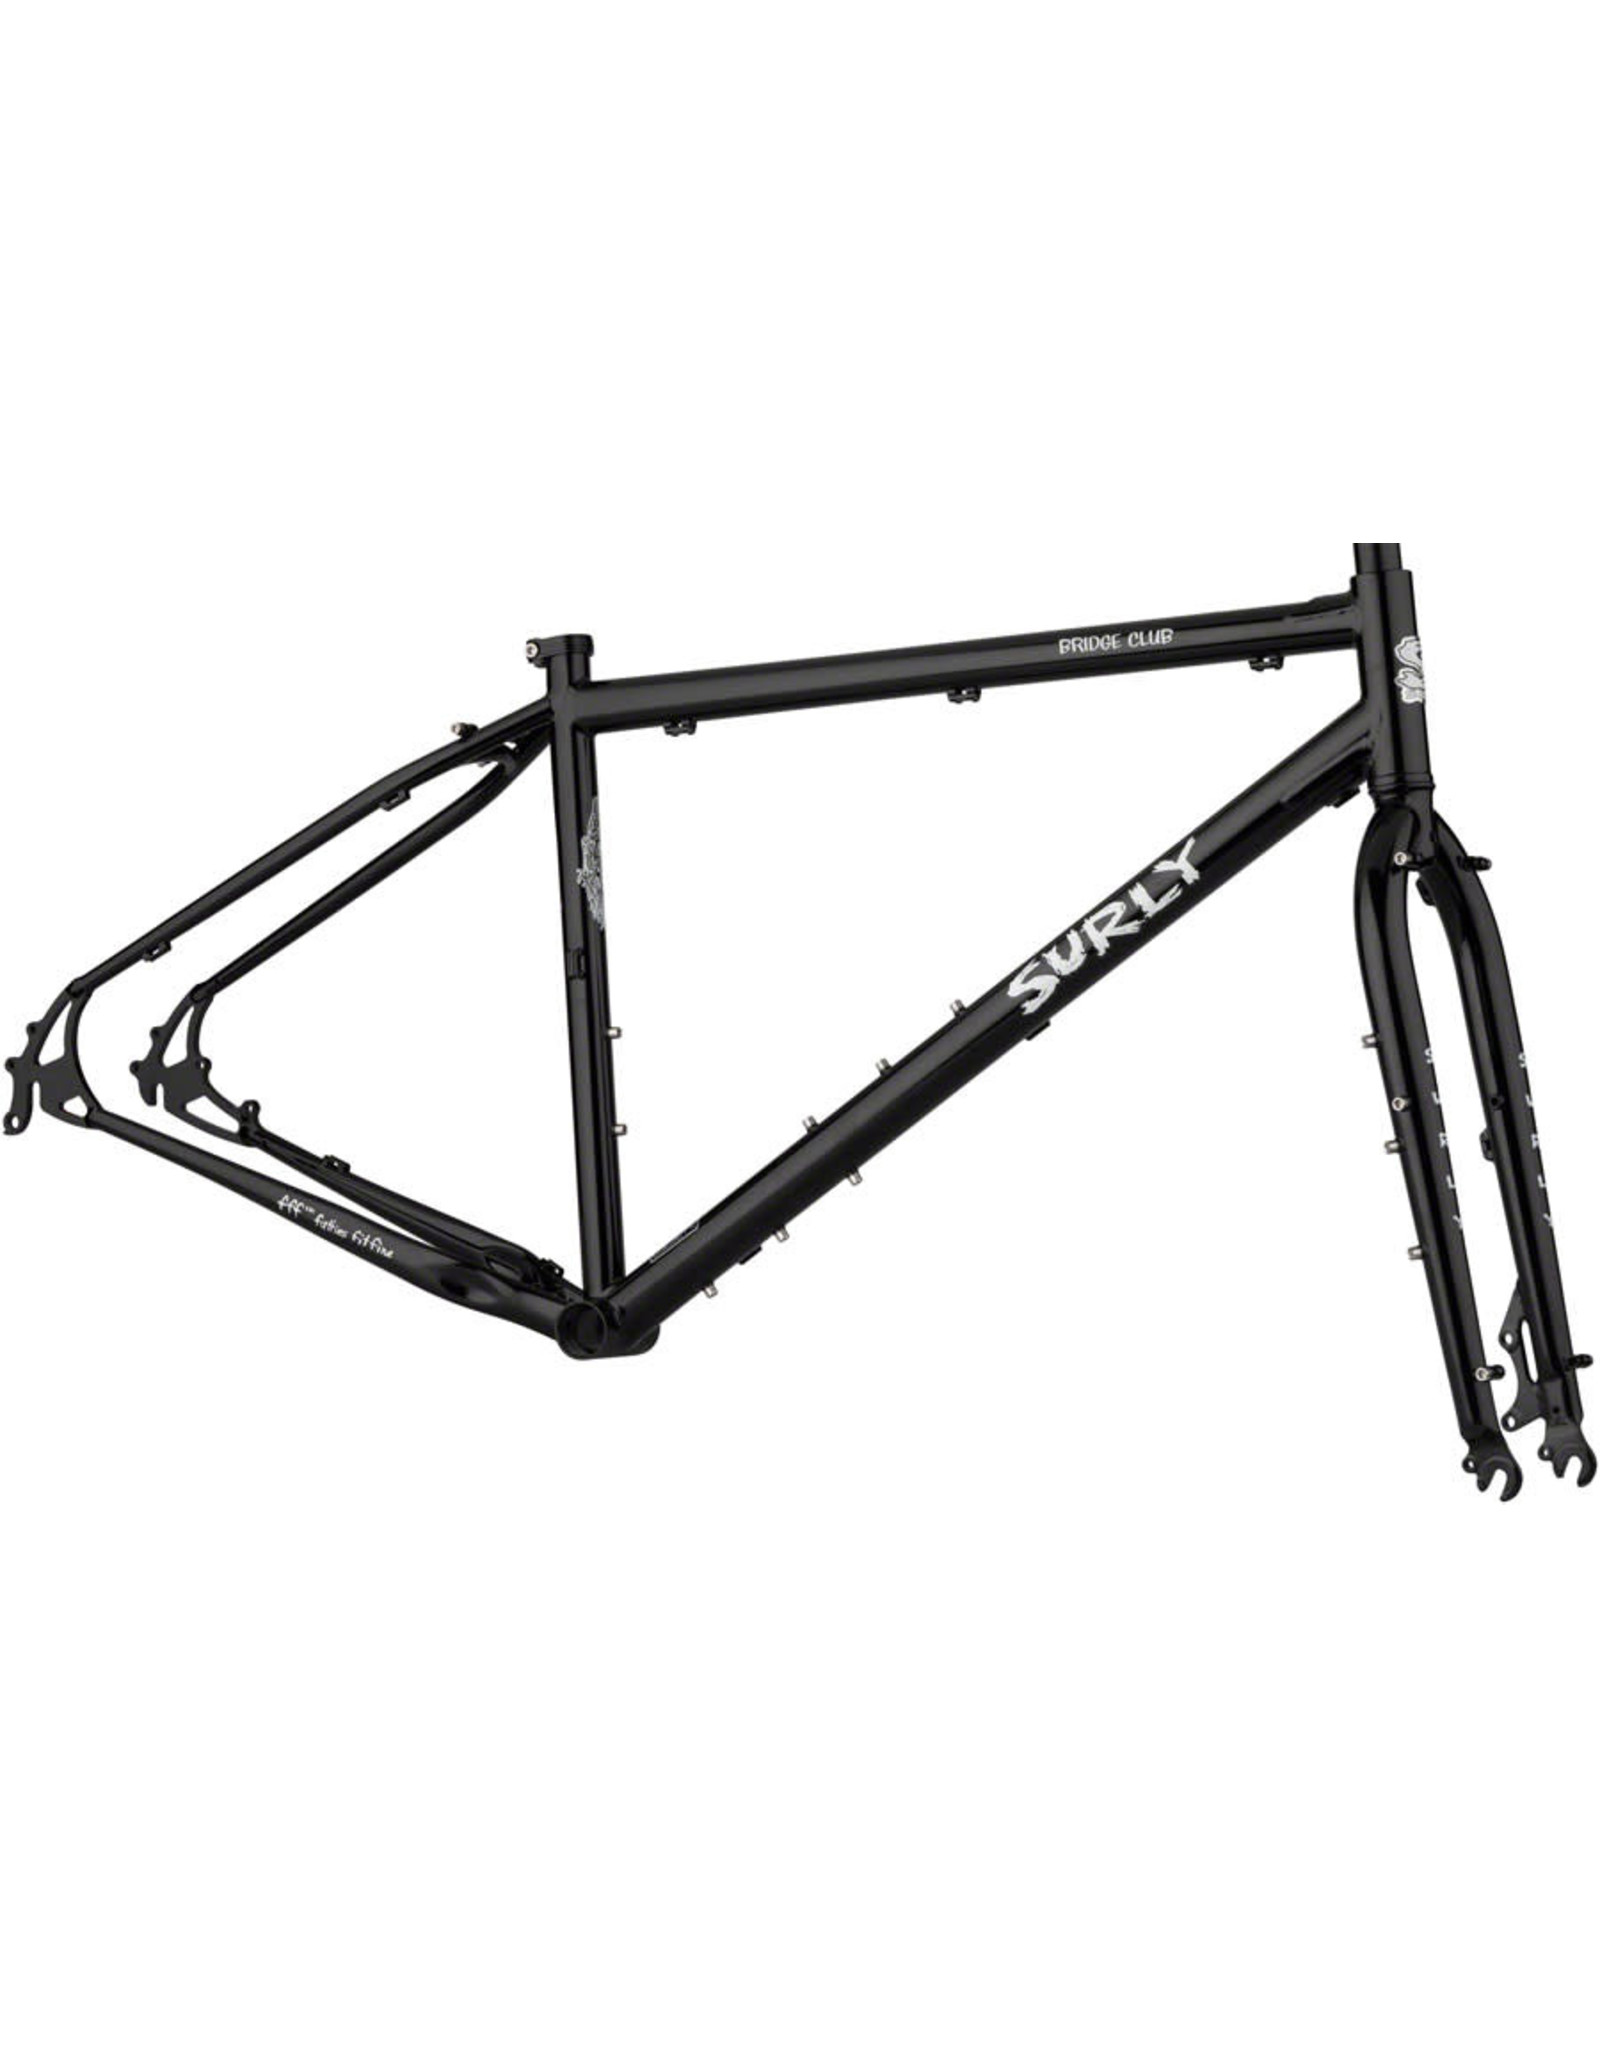 "Surly Surly Bridge Club Frameset - 27.5""/700c, Steel, Black, Large"